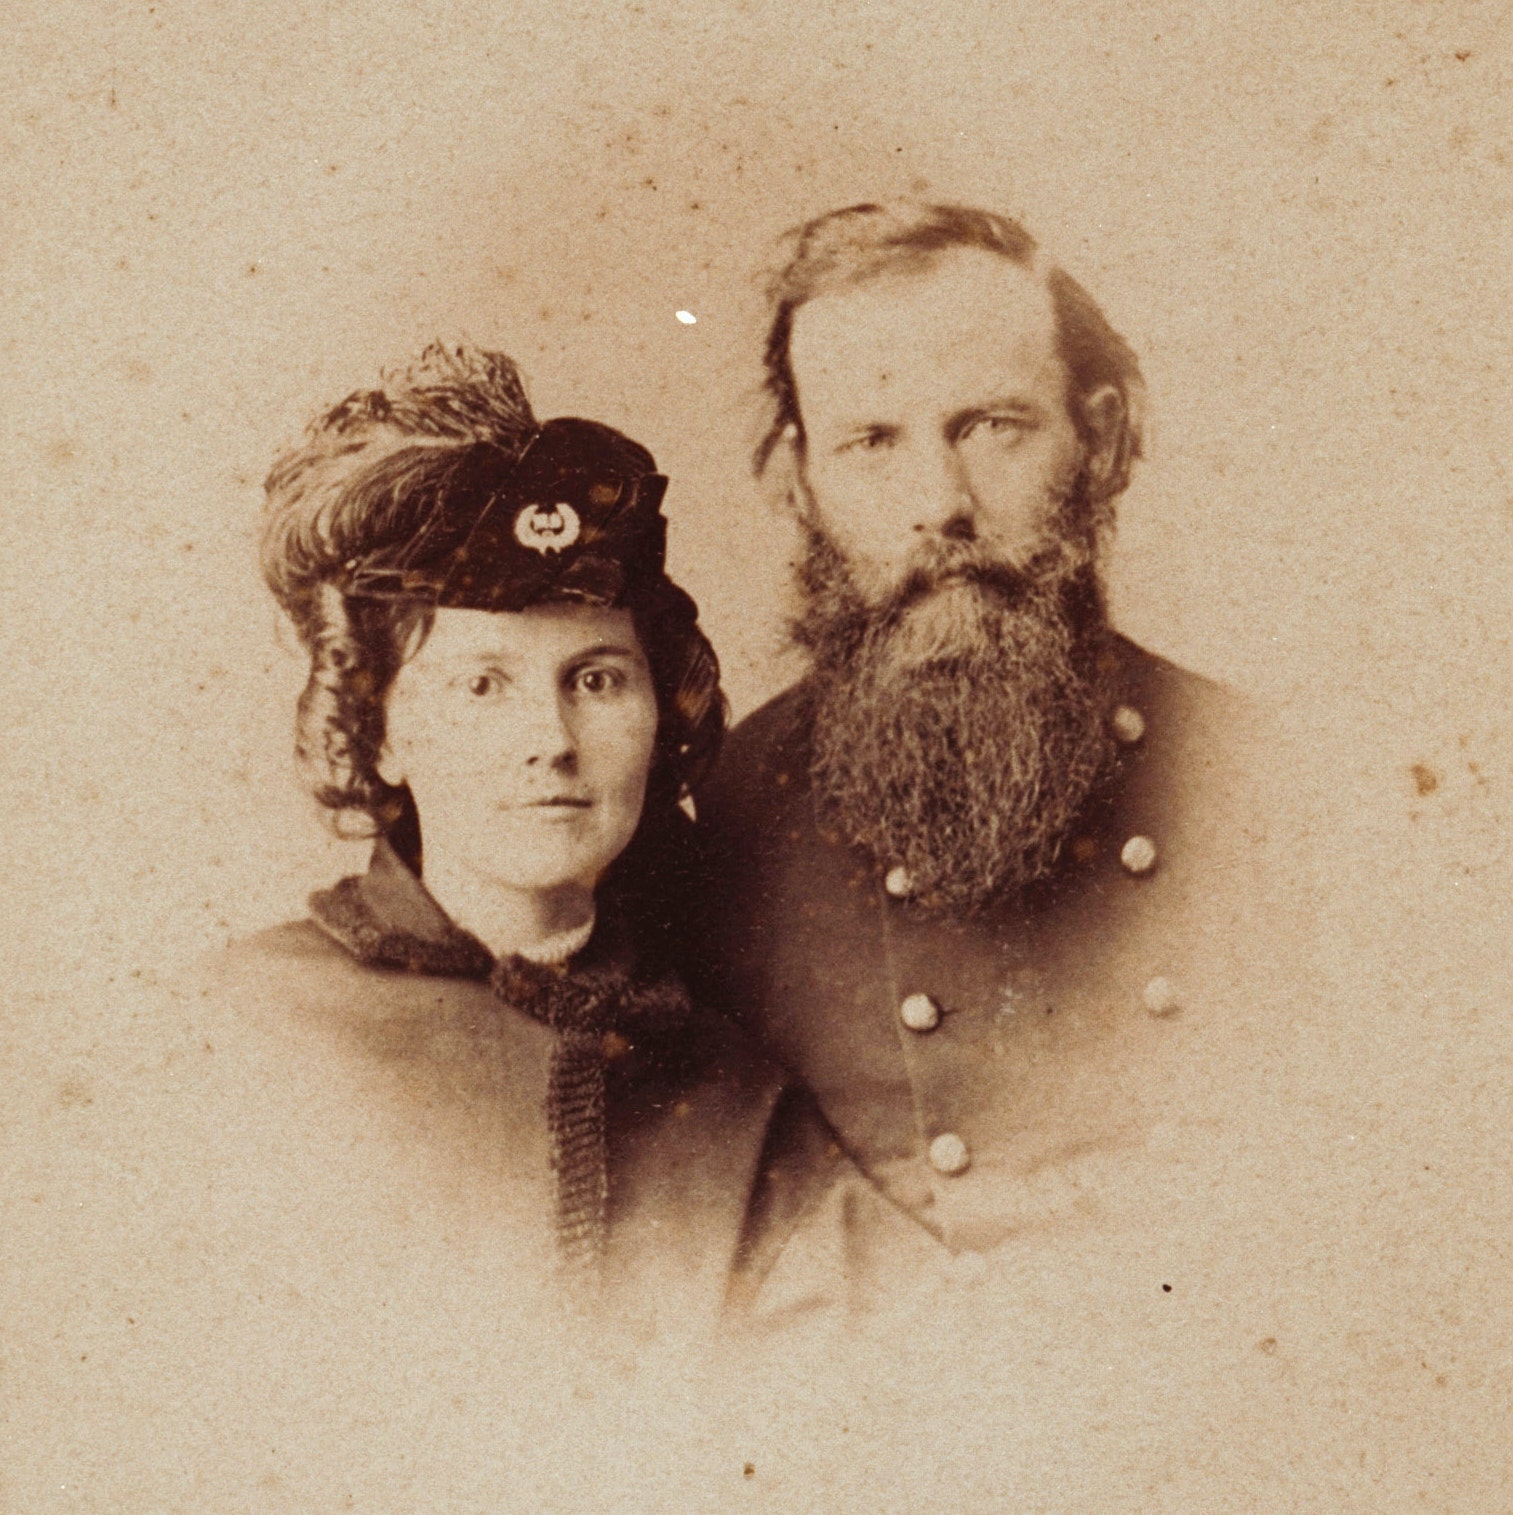 Portrait of James and Frances Beecher